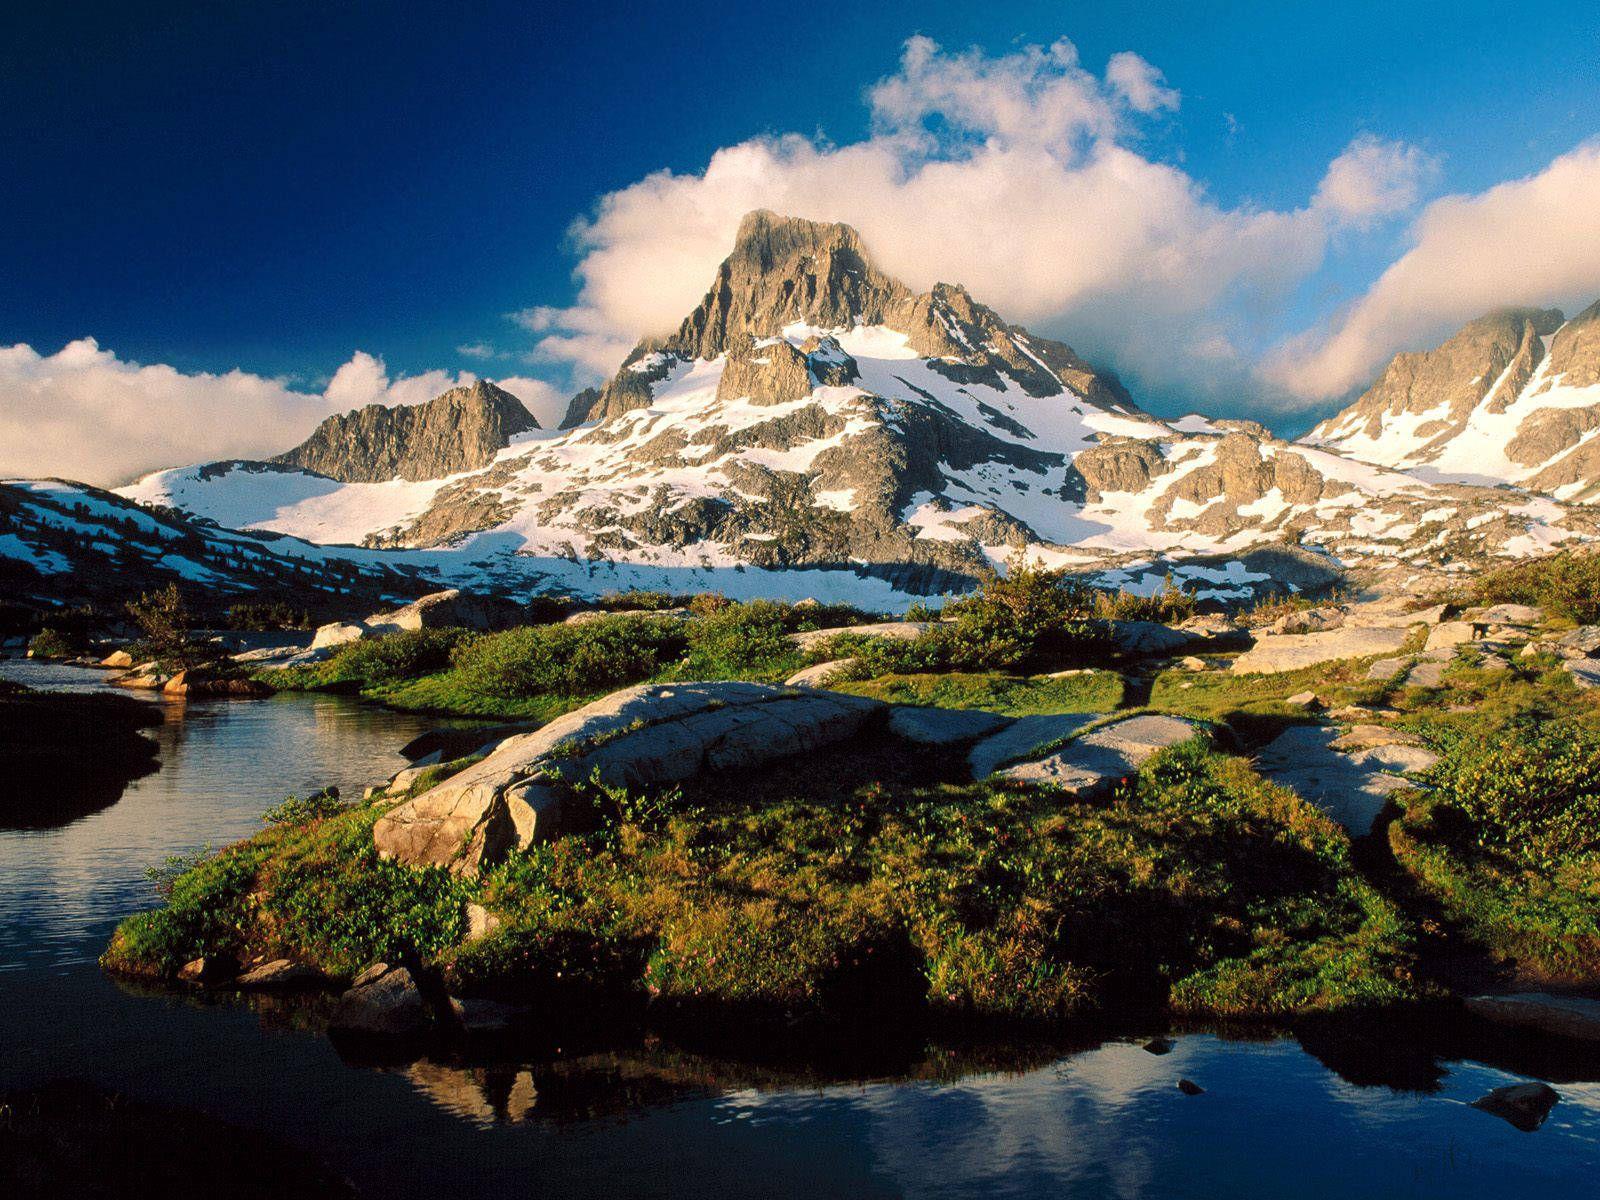 Another Beautiful Scene Island Lake Ansel Adams California Travel